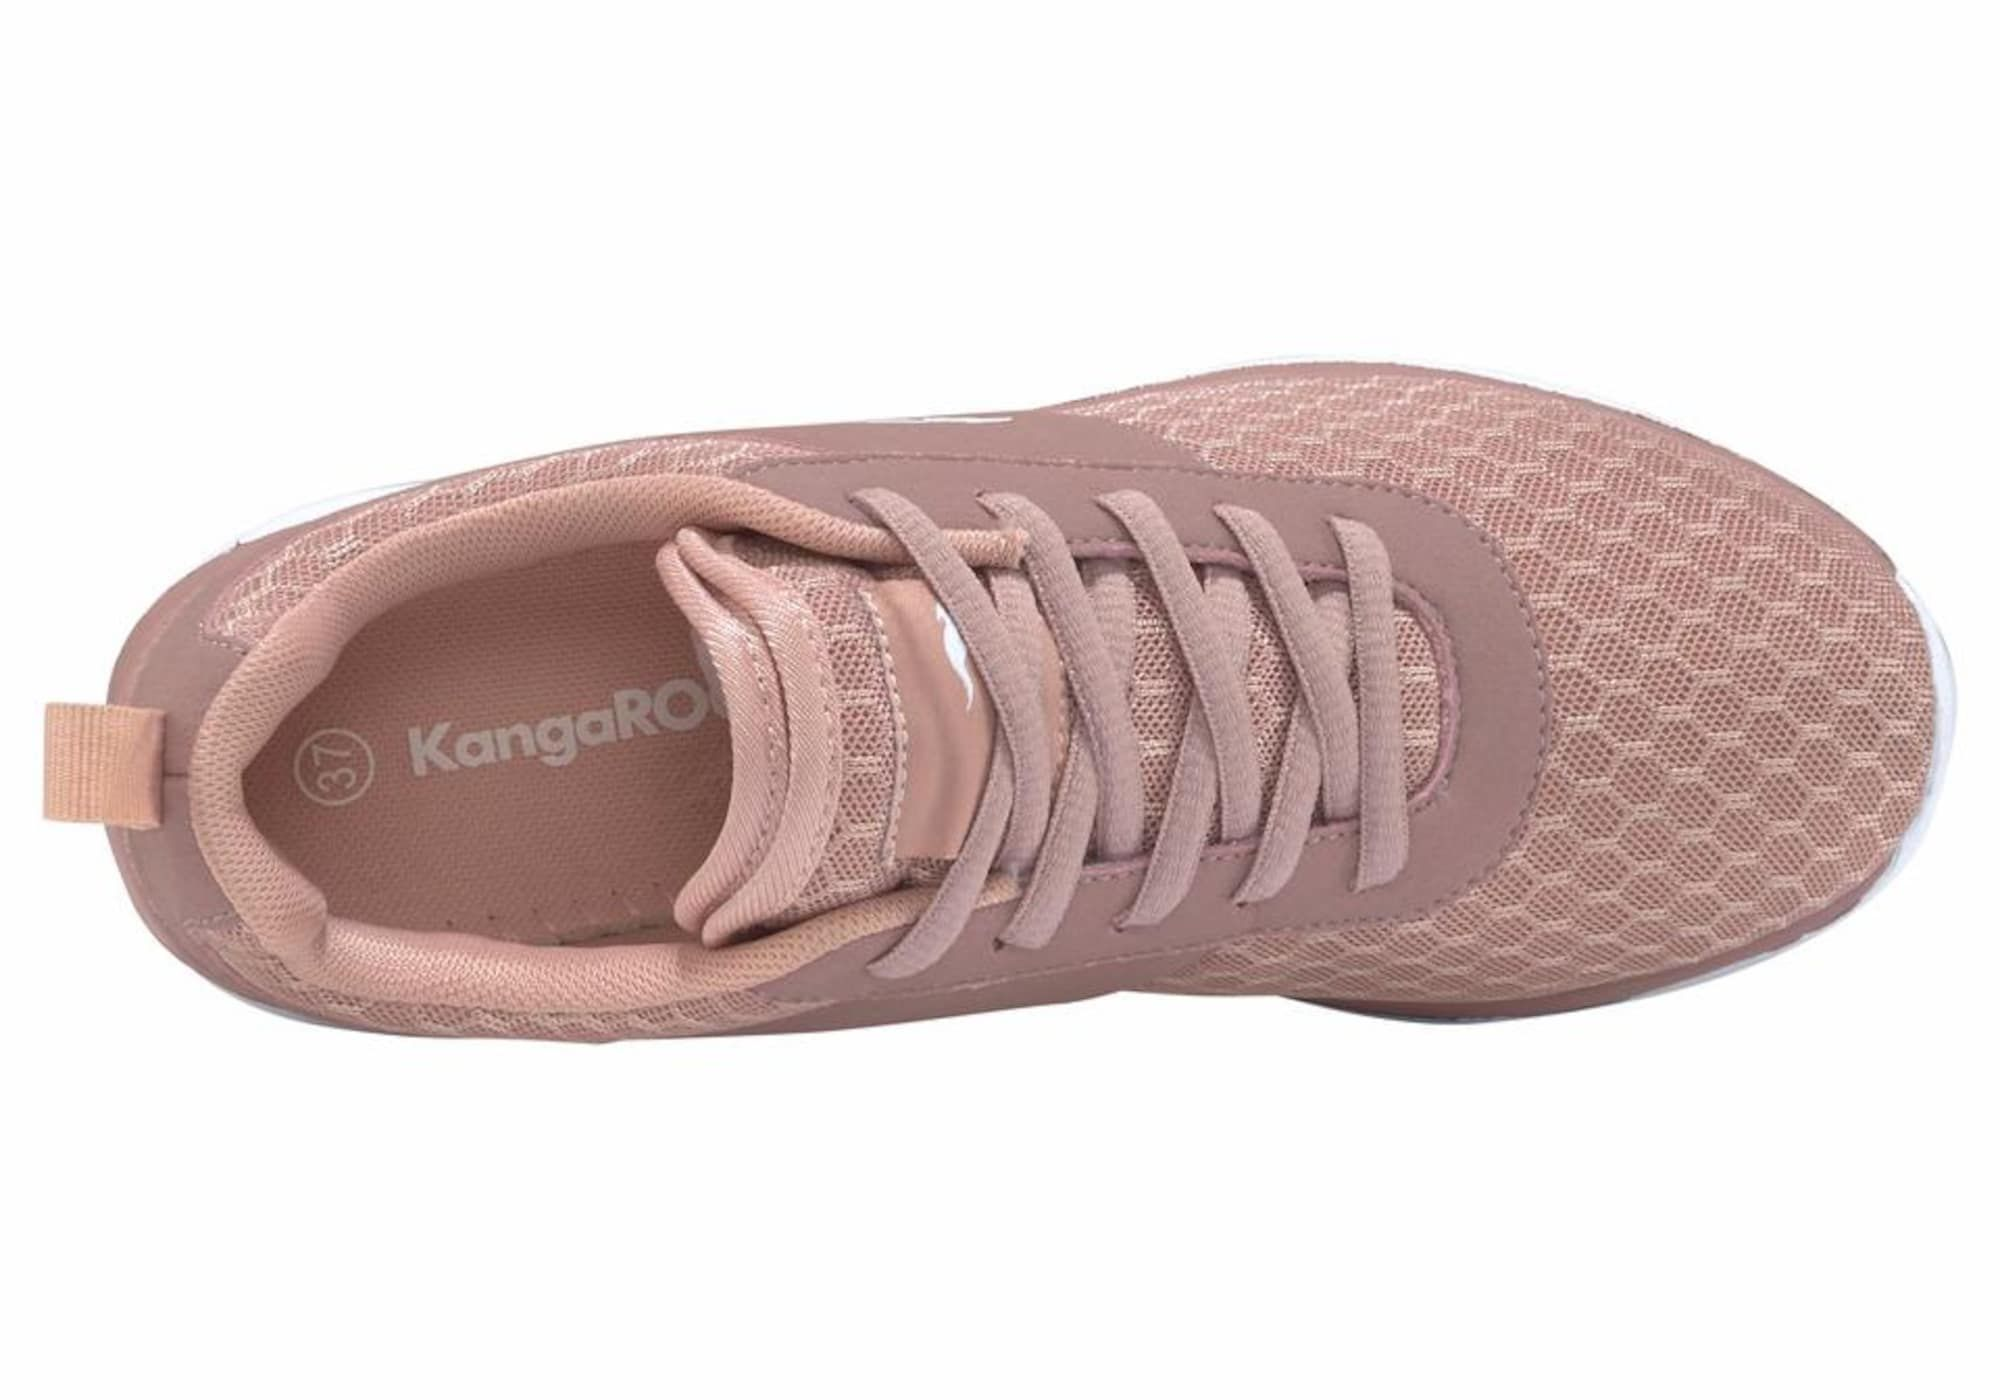 Kangaroos Sneaker Bumpy Damen Altrosa Weiss Grosse 38 Altrosa Rosa Und Damen